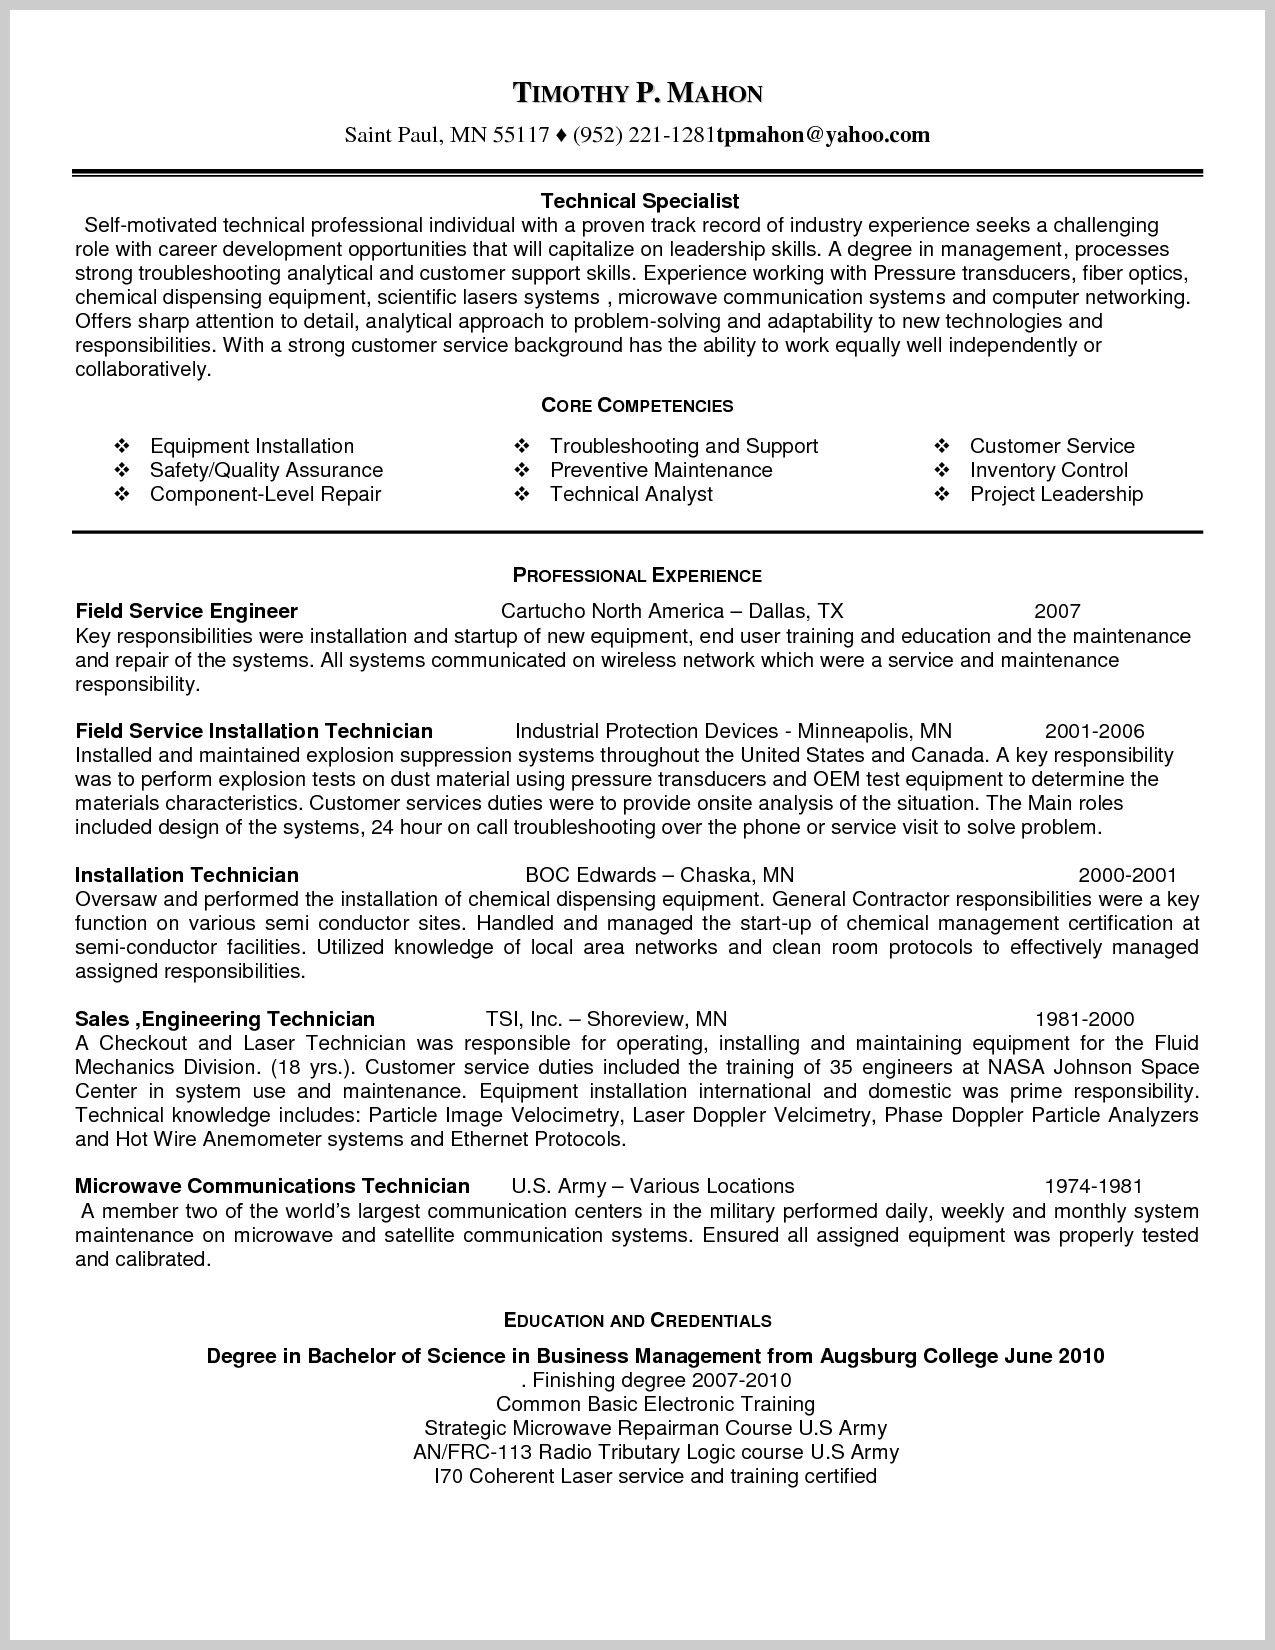 Sample Resume For Field Service Technician